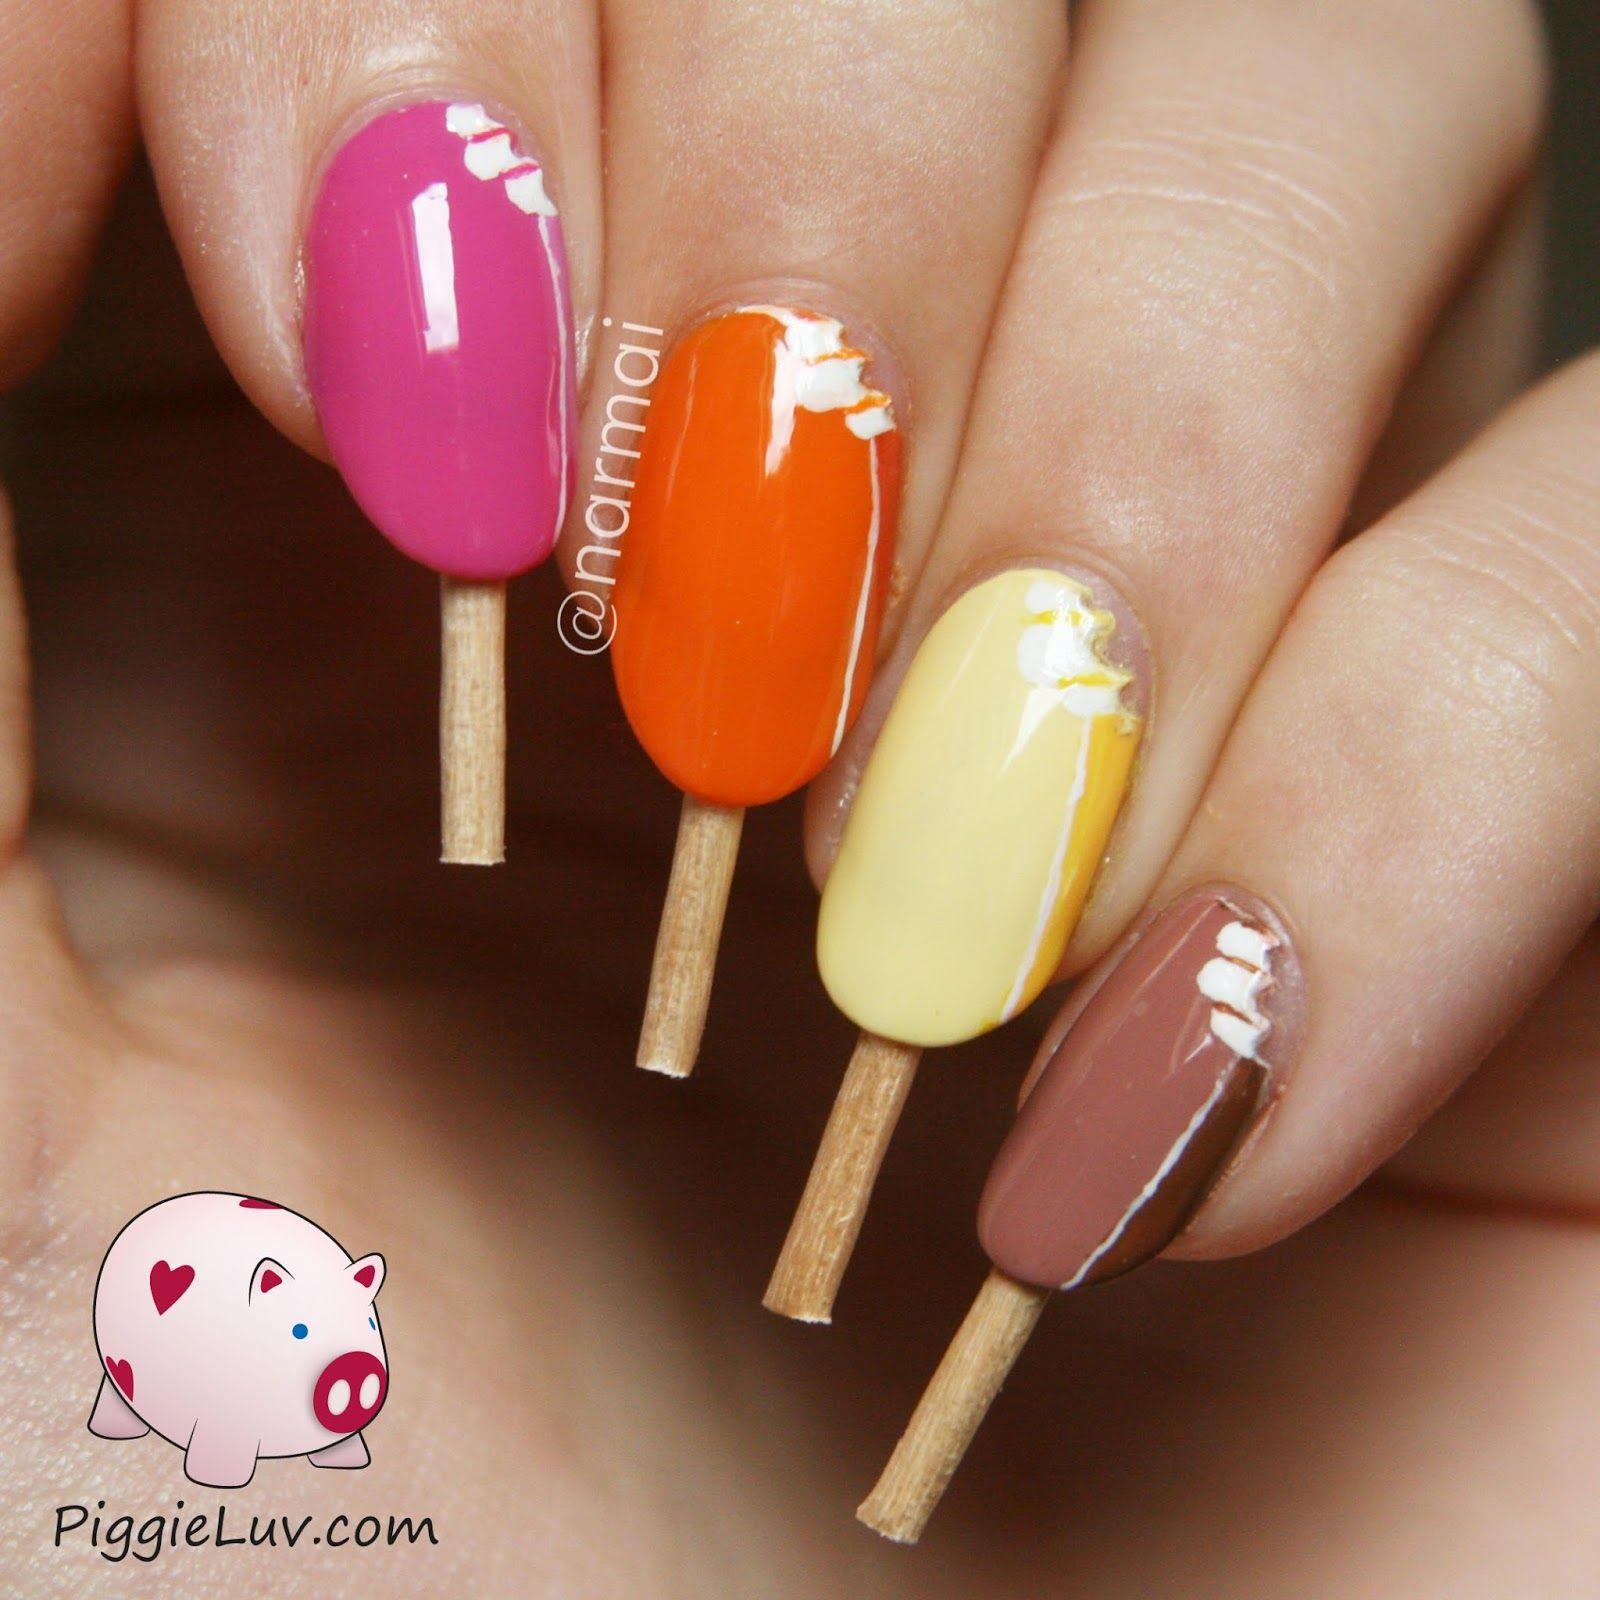 Magnum ice cream nail art with video tutorial!   Ice cream nails ...